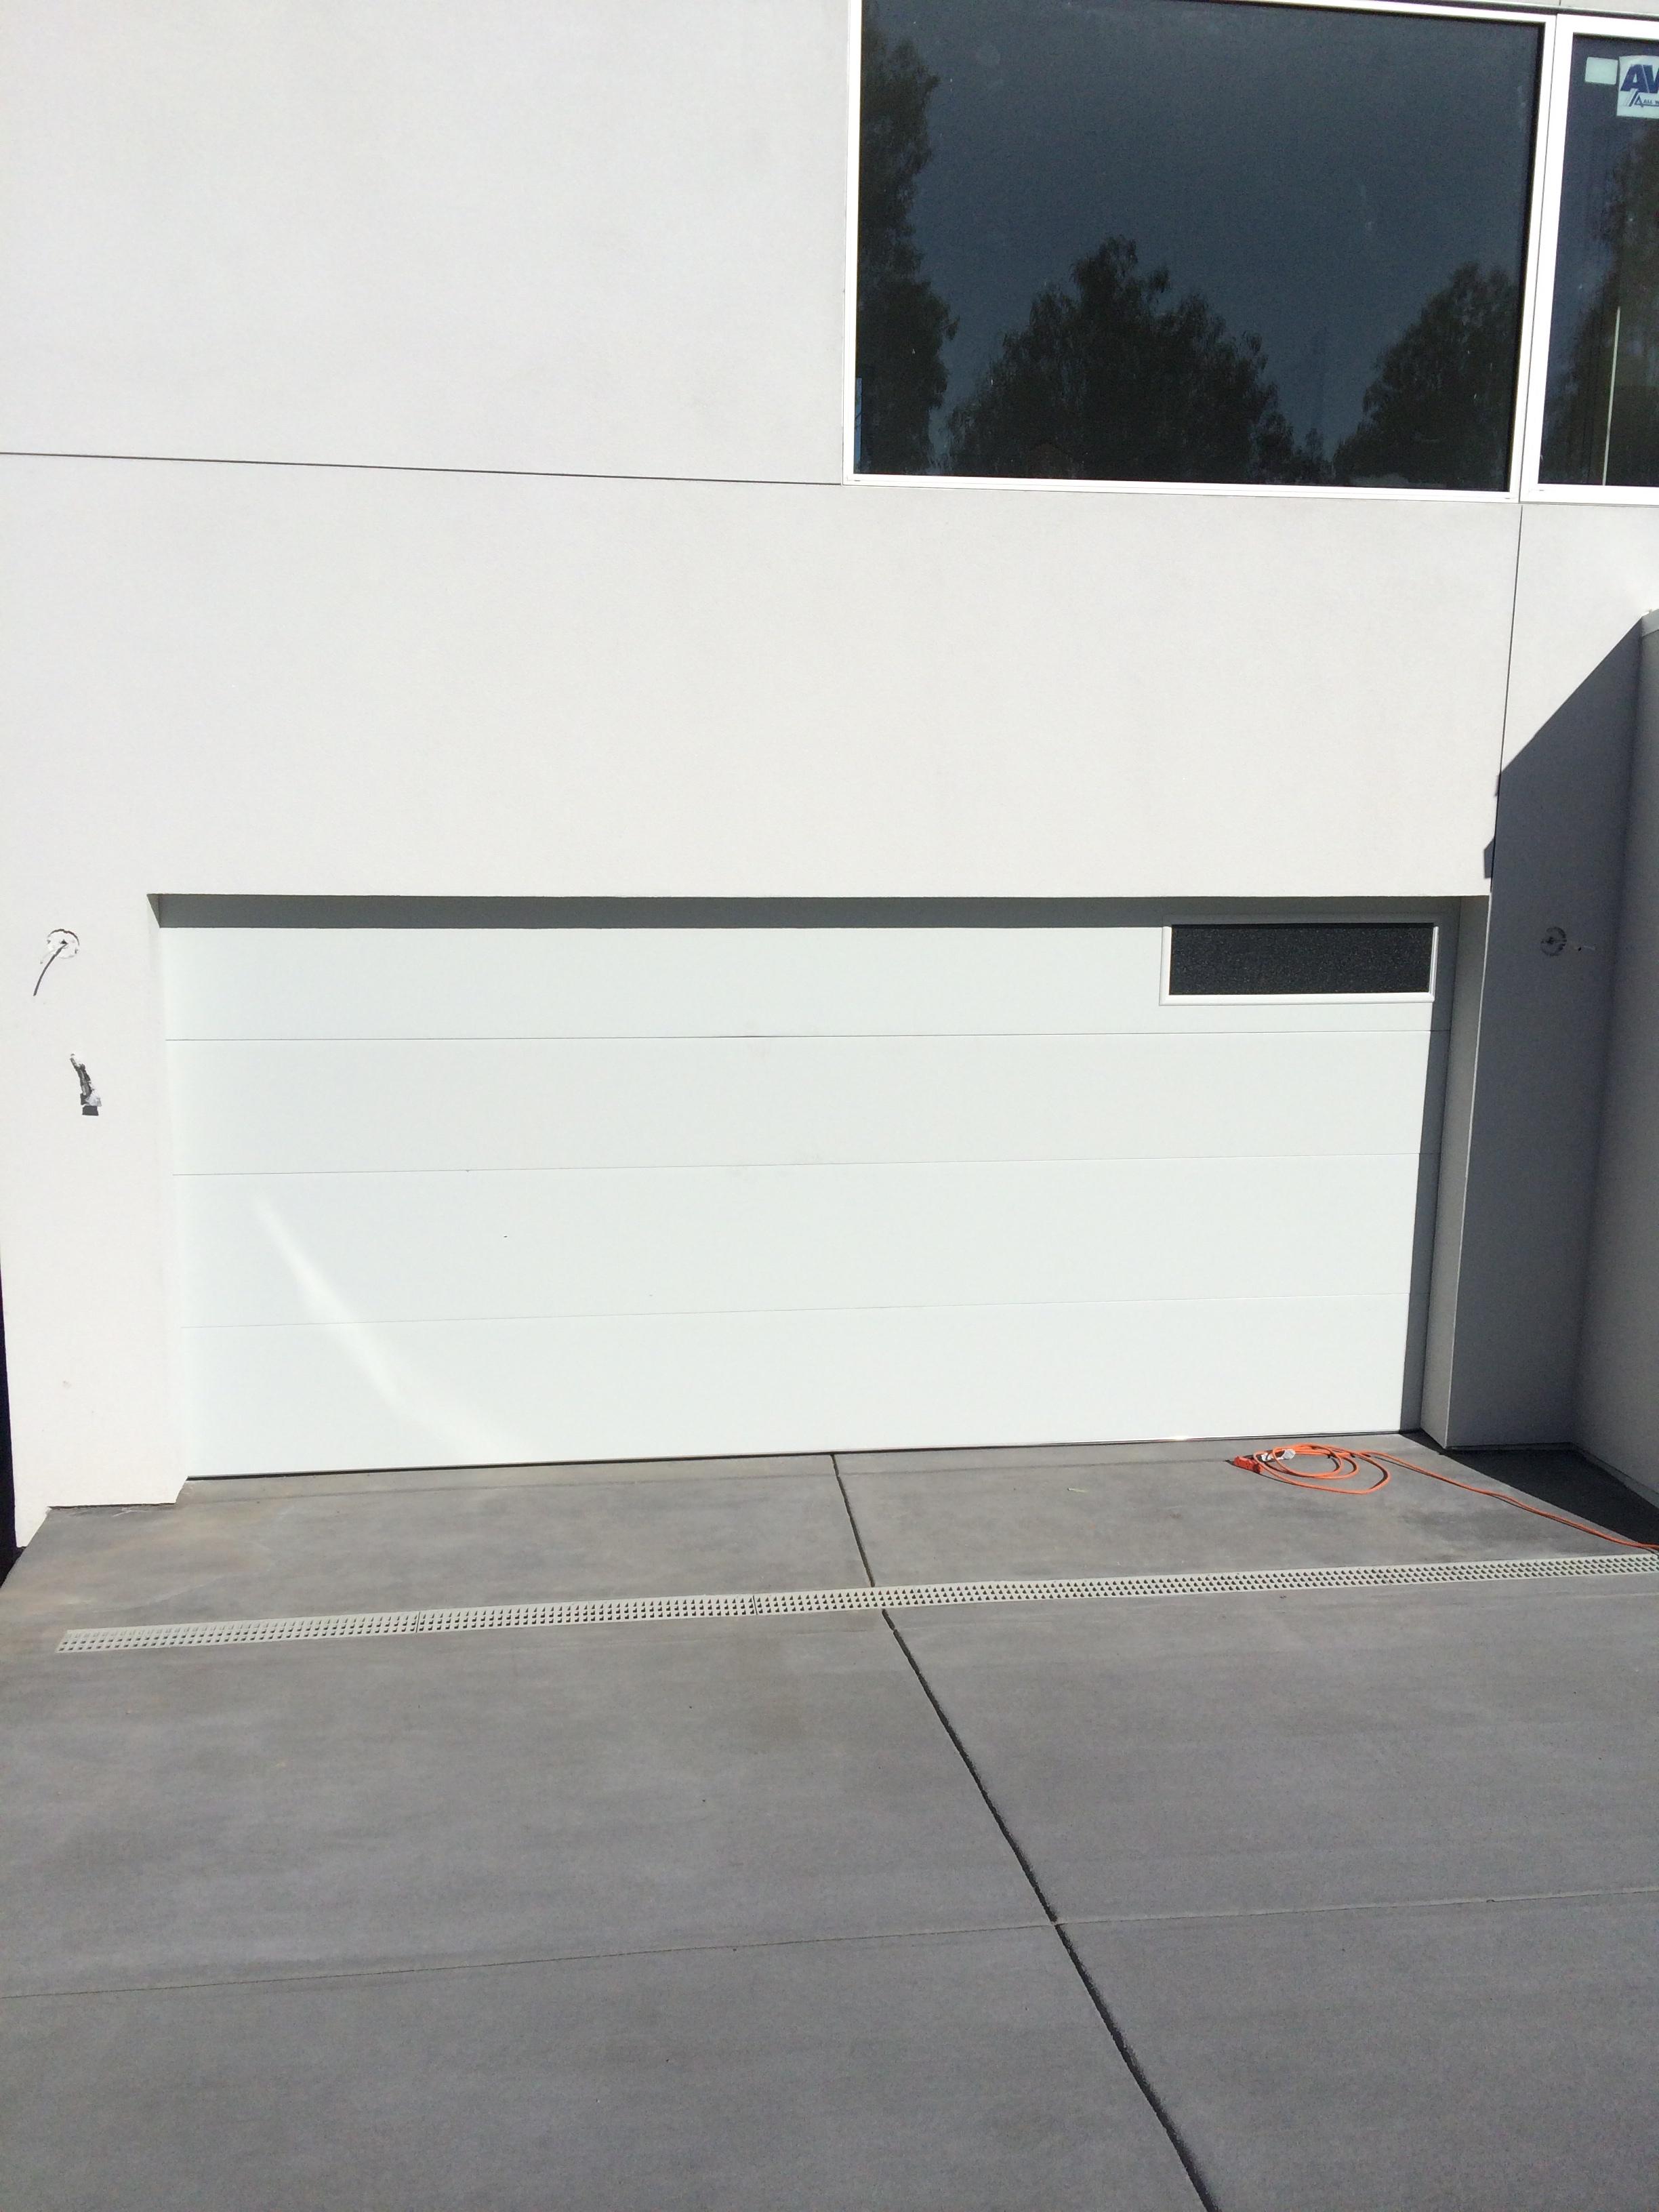 All Bay Garage Doors - Flush Panel Garage Doors - Kevin Chervatin - 50.jpg